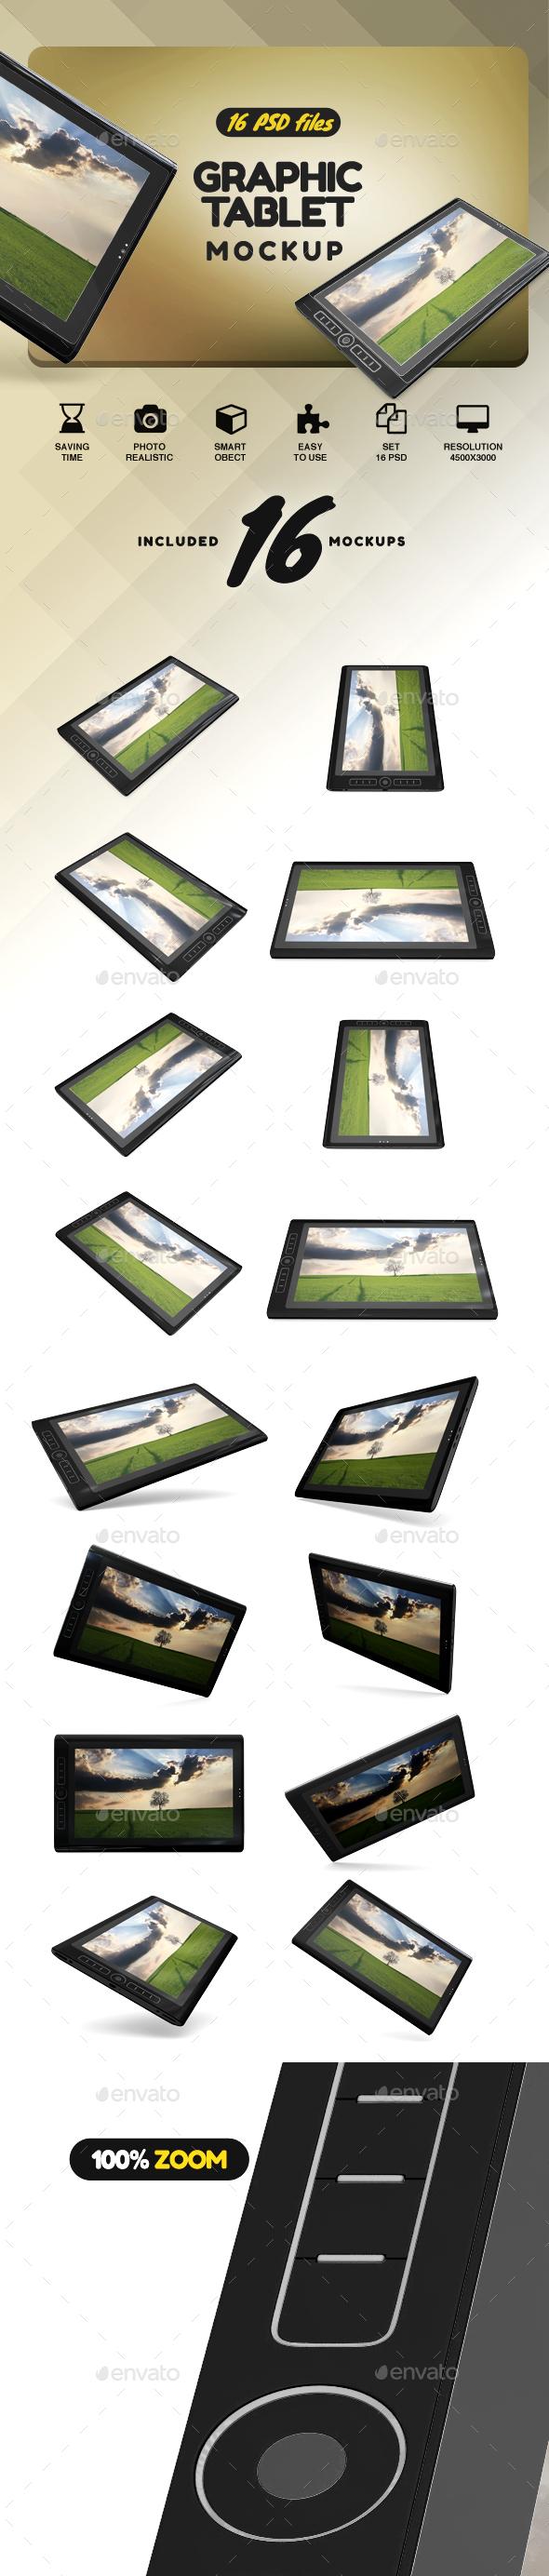 Graphic Tablet Mockup - Monitors Displays